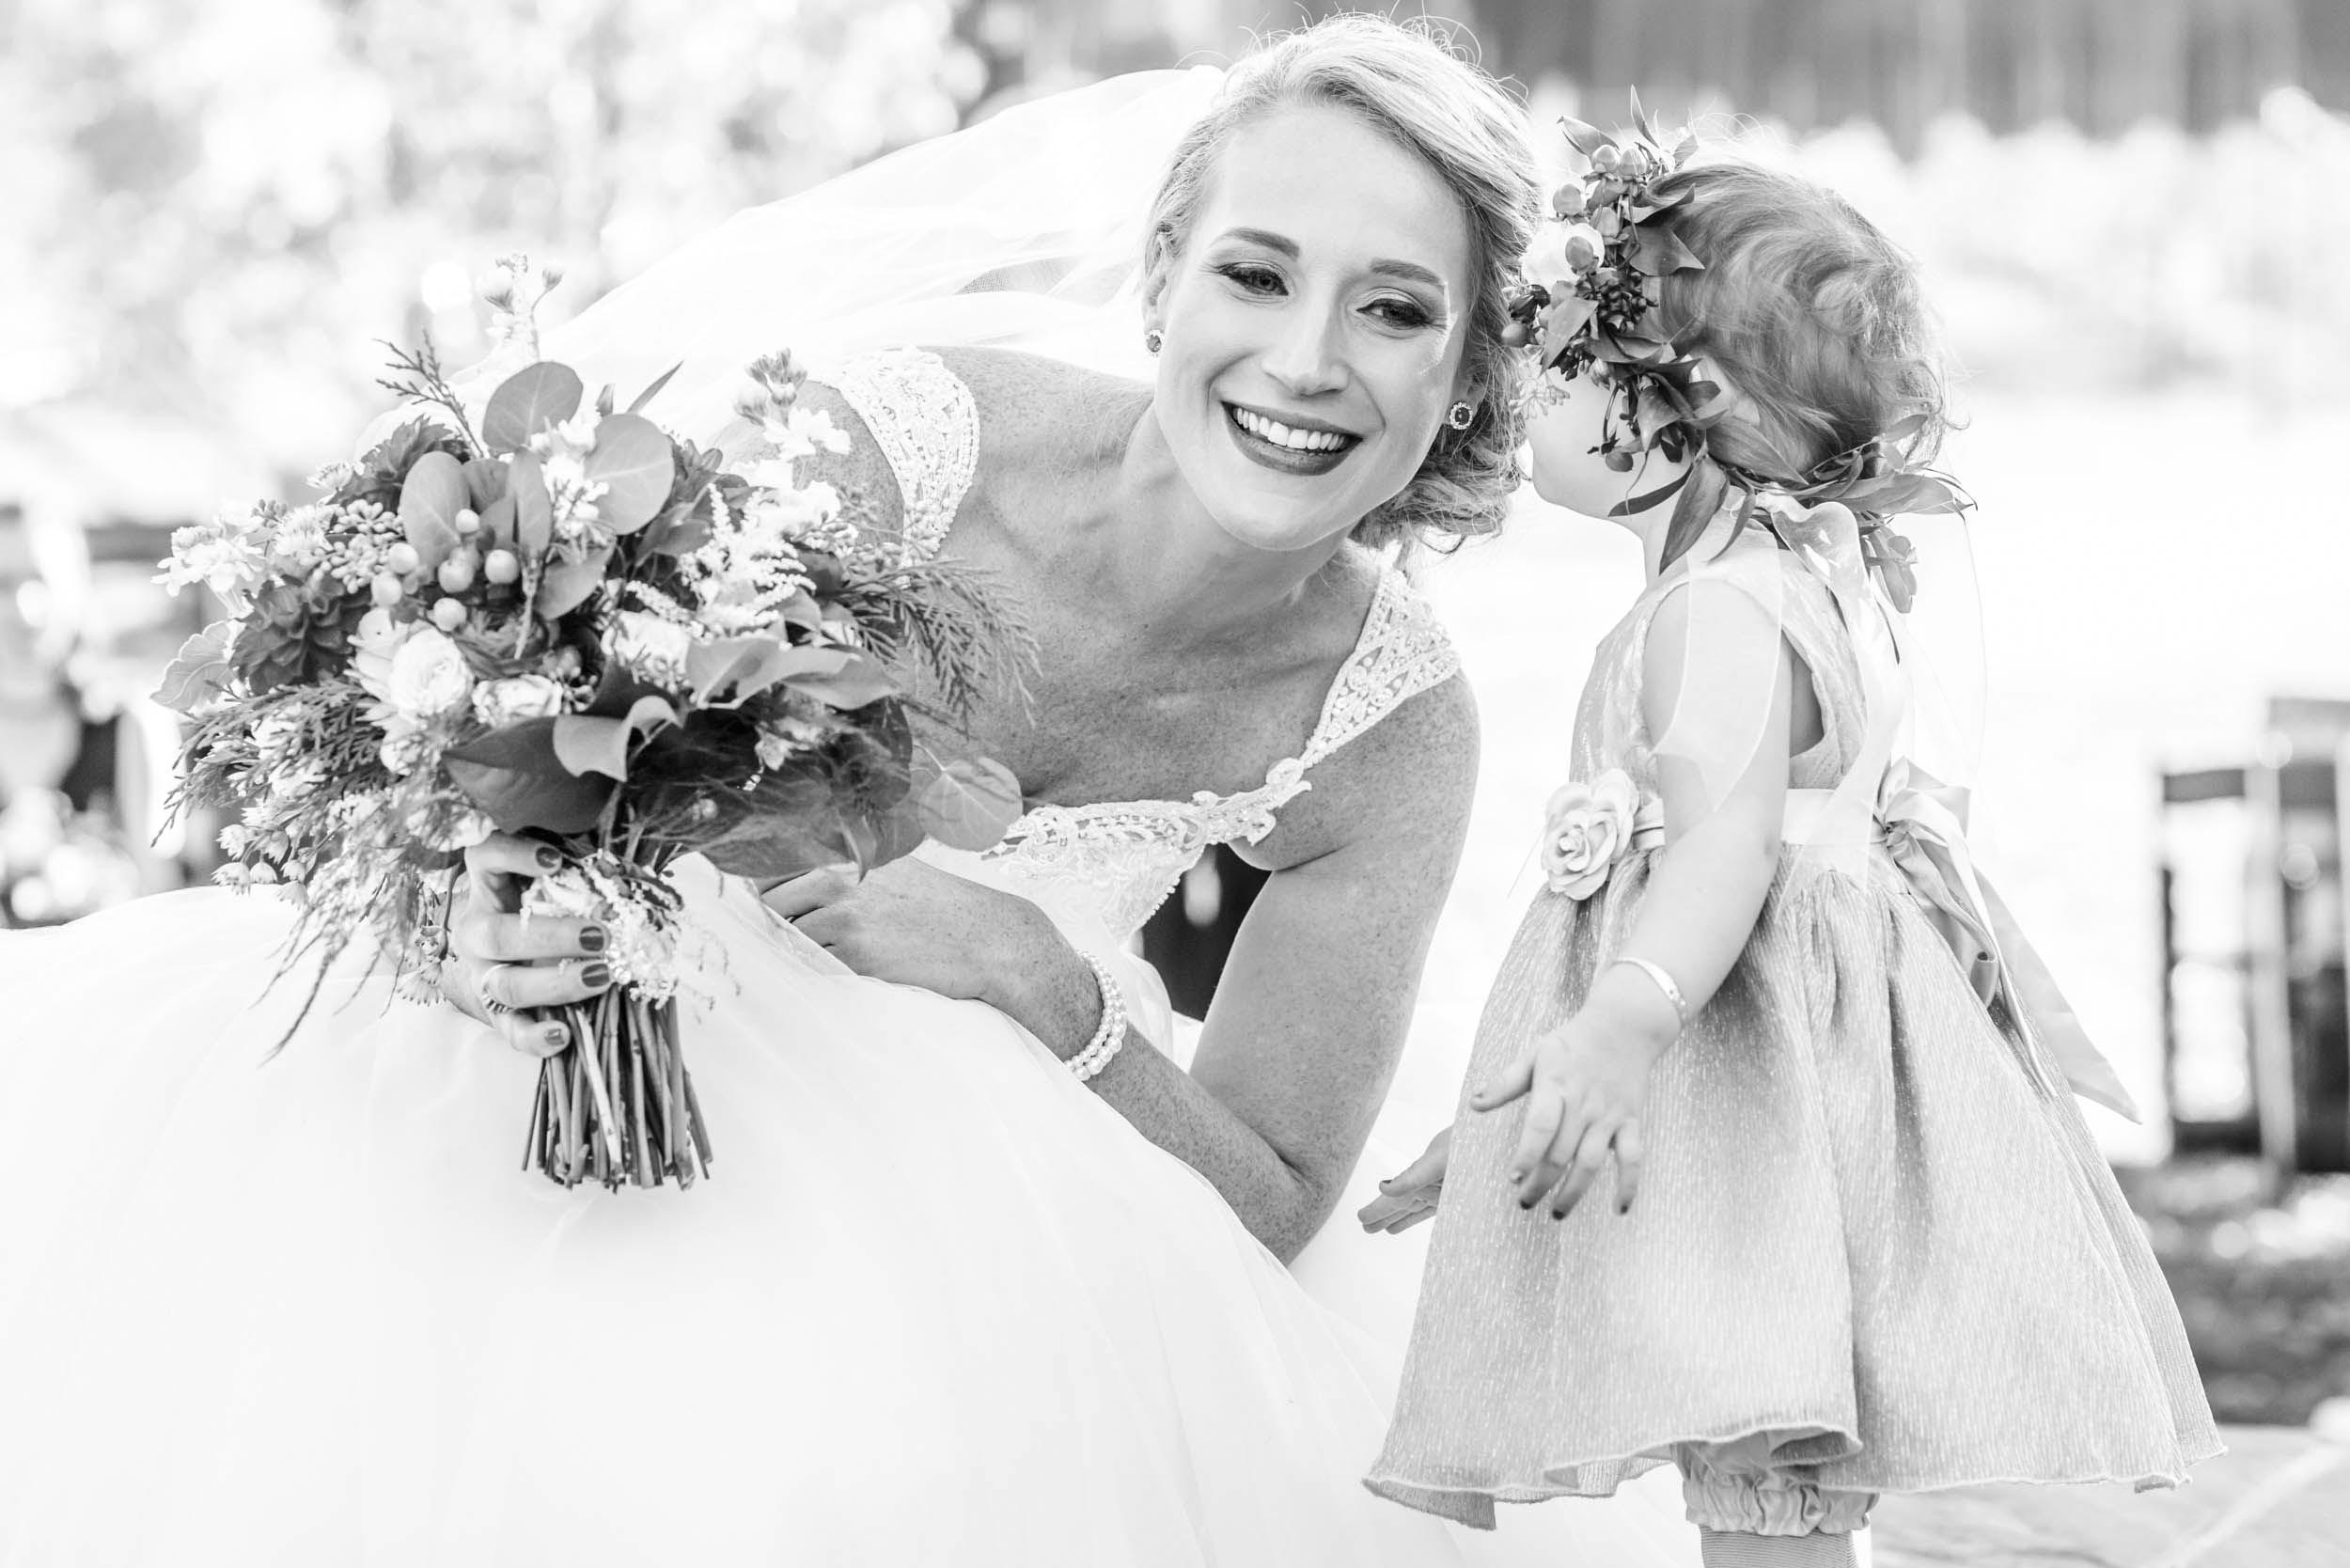 Weddings+by+Vadym+Guliuk-40001-1-37.jpg